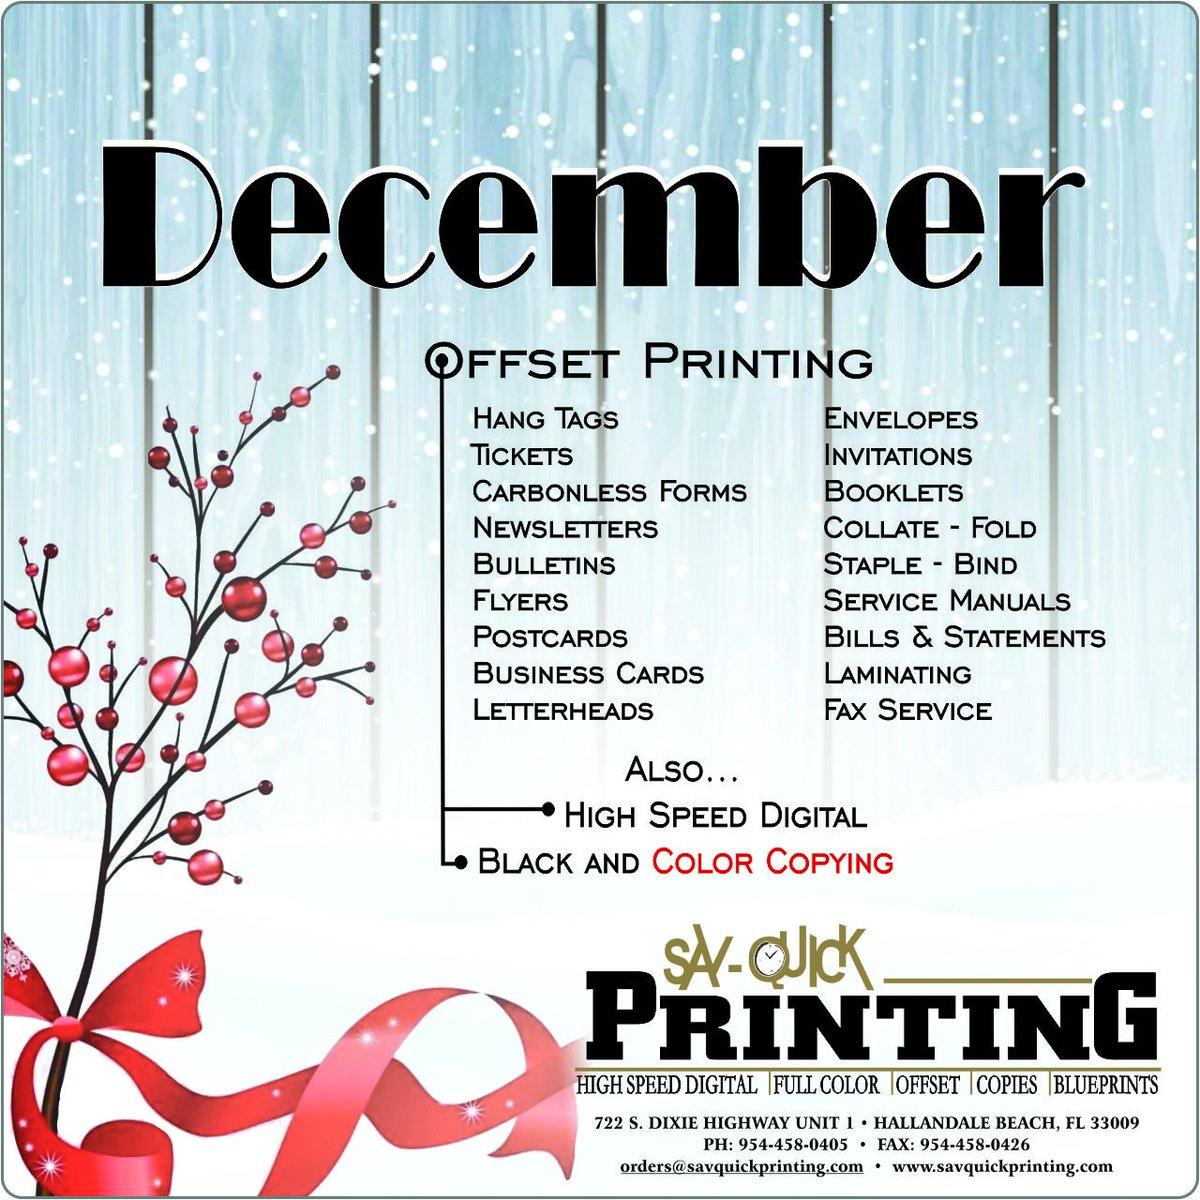 Sav quick printing sqprinting twitter agnonlegend and ray hanna malvernweather Gallery